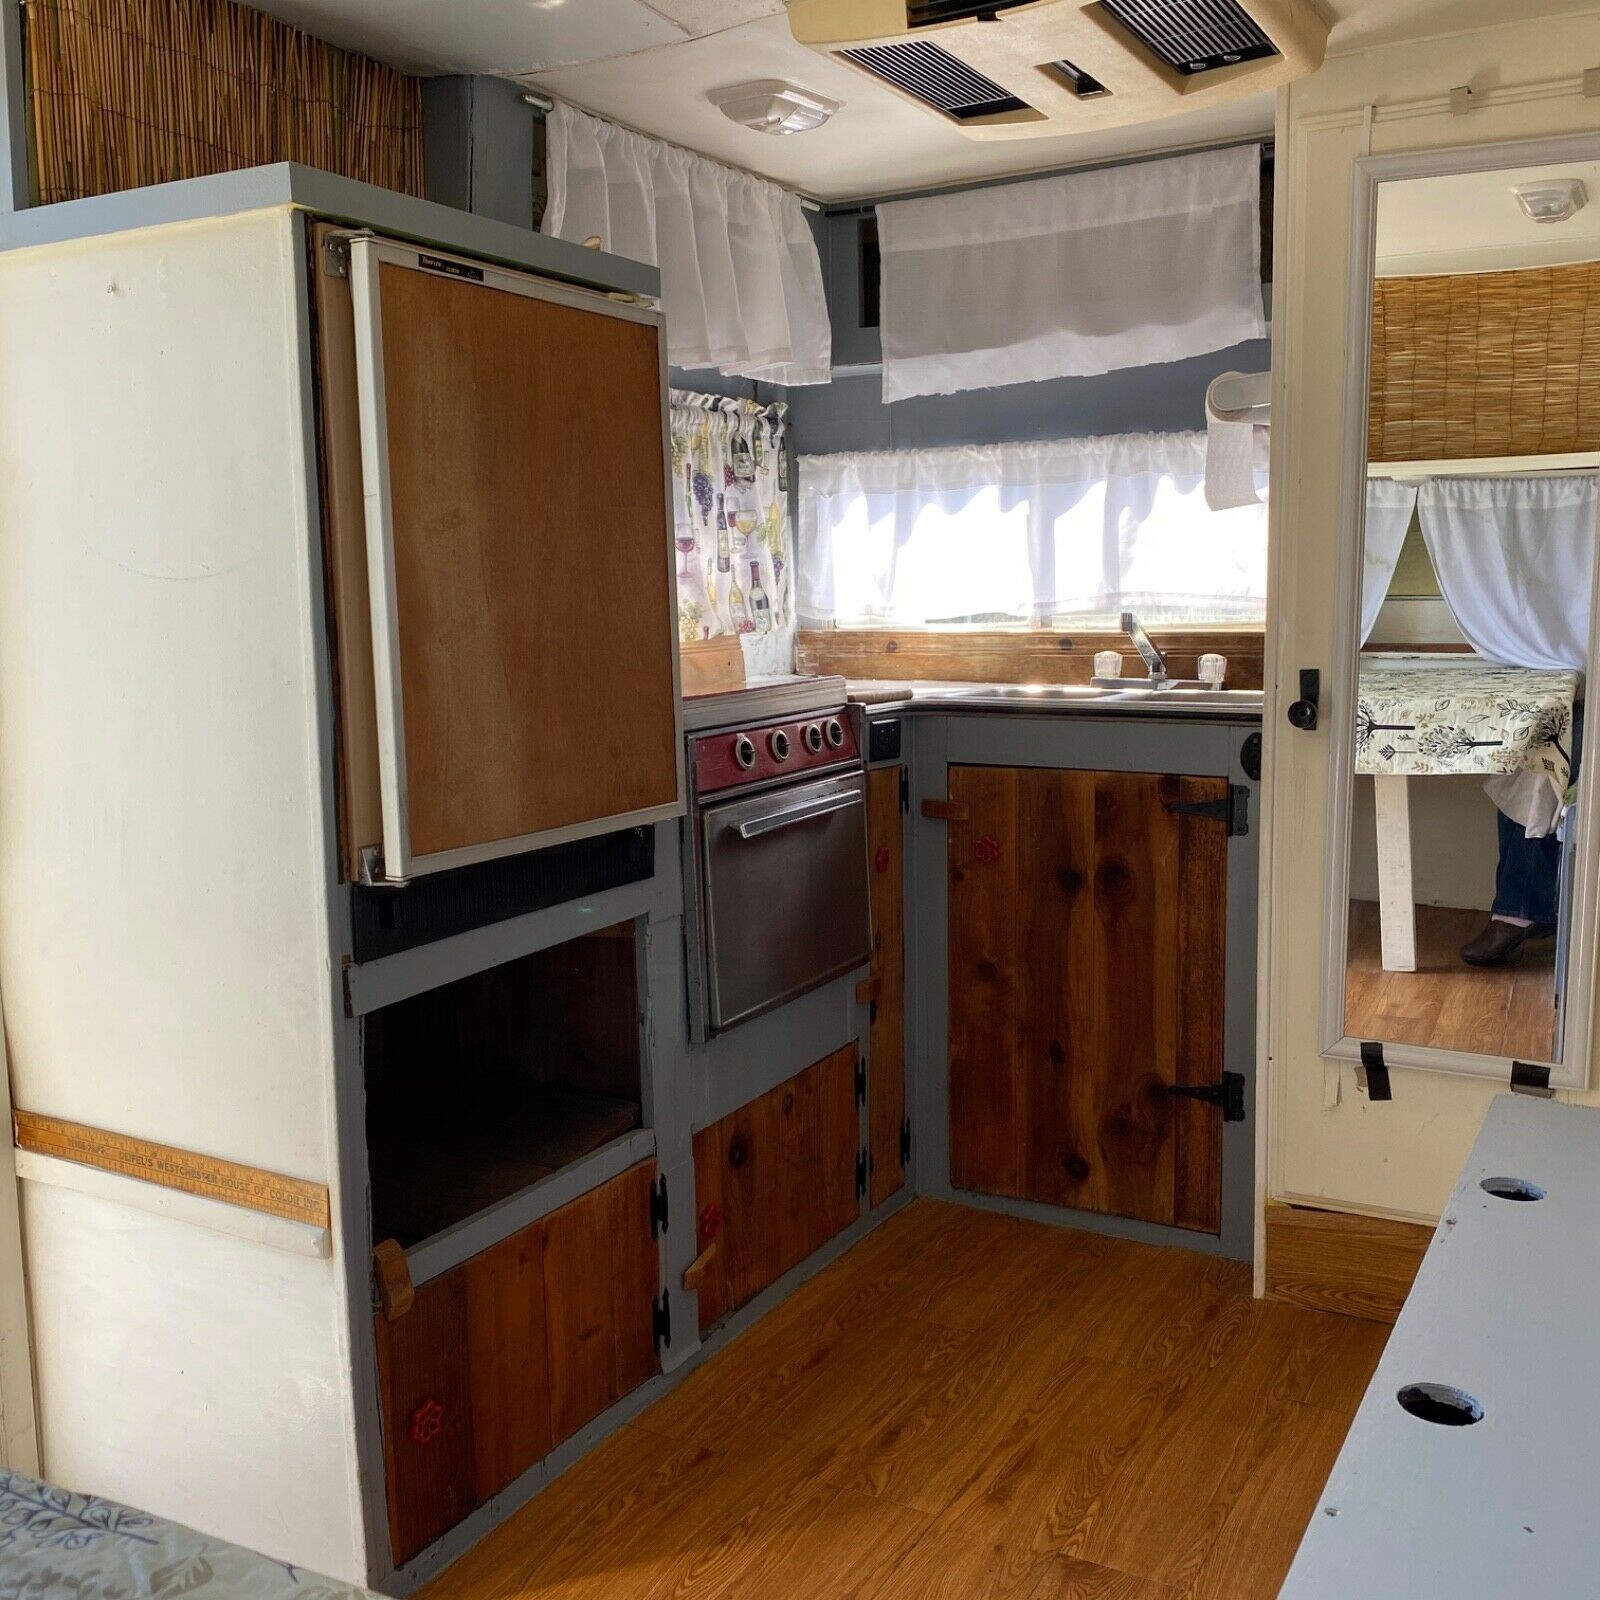 restored 1977 Metoo 249 CT camper